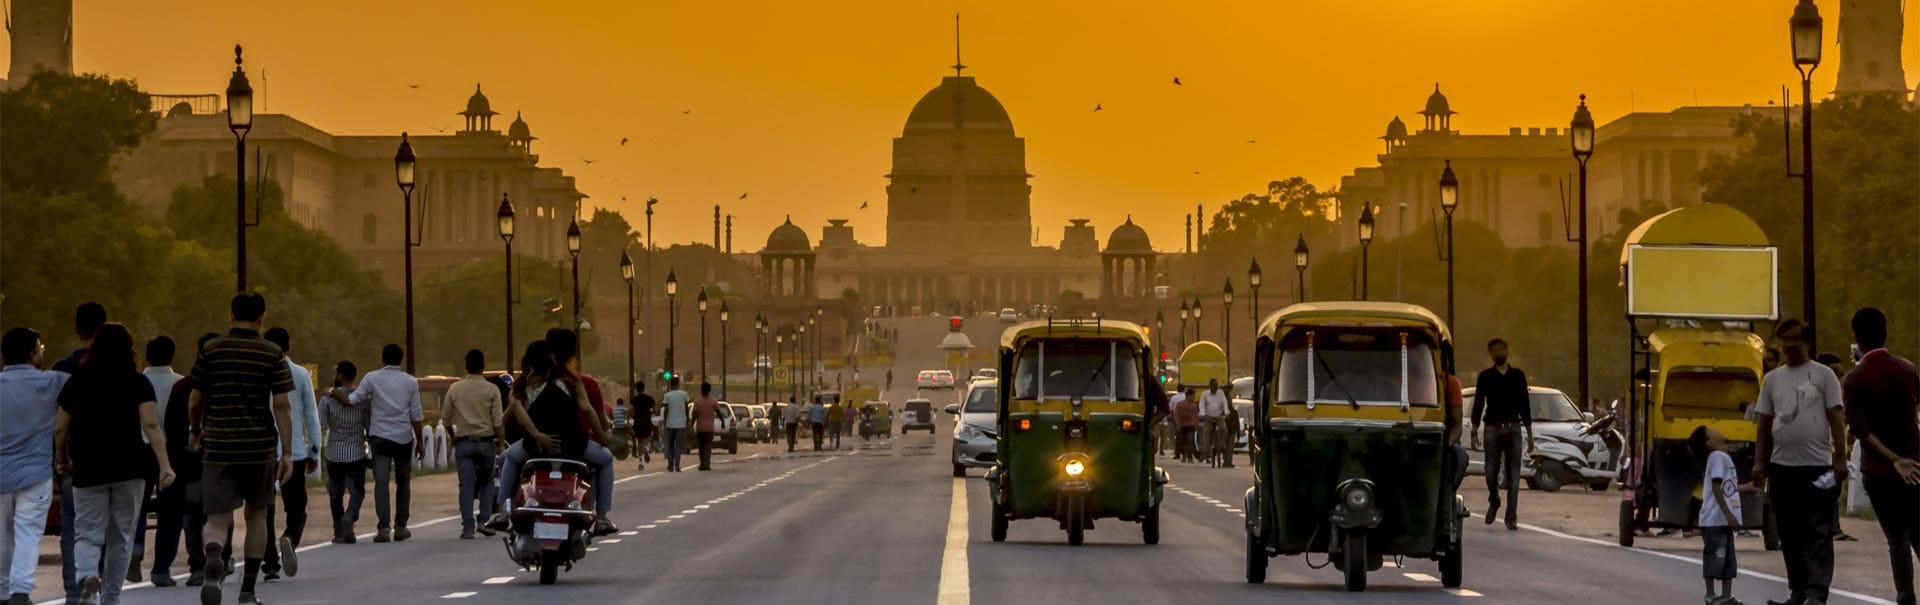 Delhi Agra (STDA) Banner